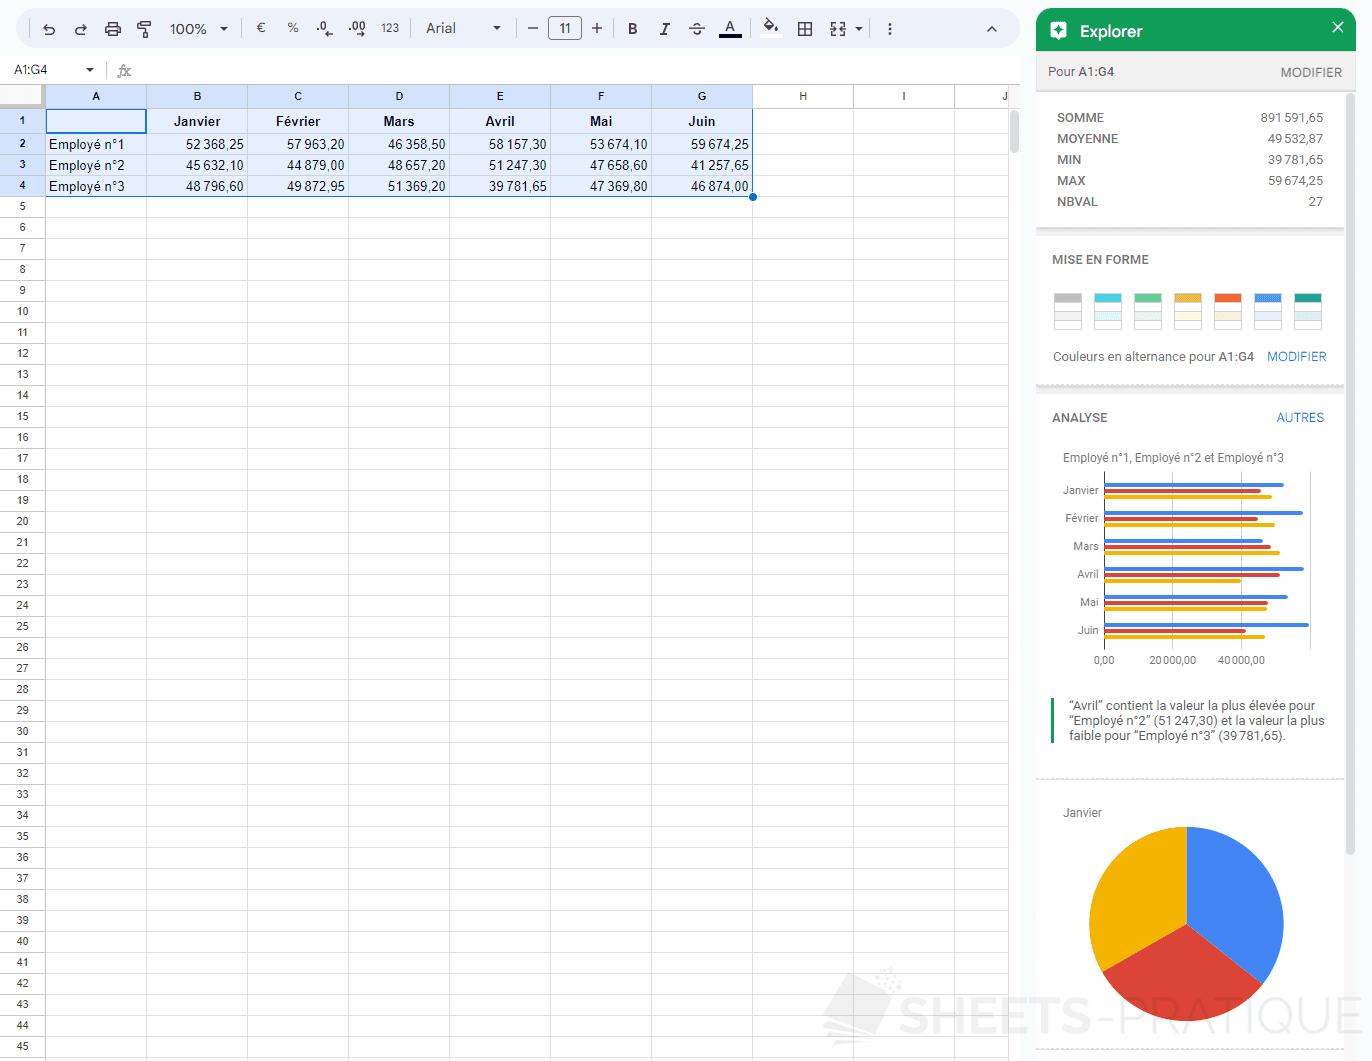 google sheets explorer png graphiques